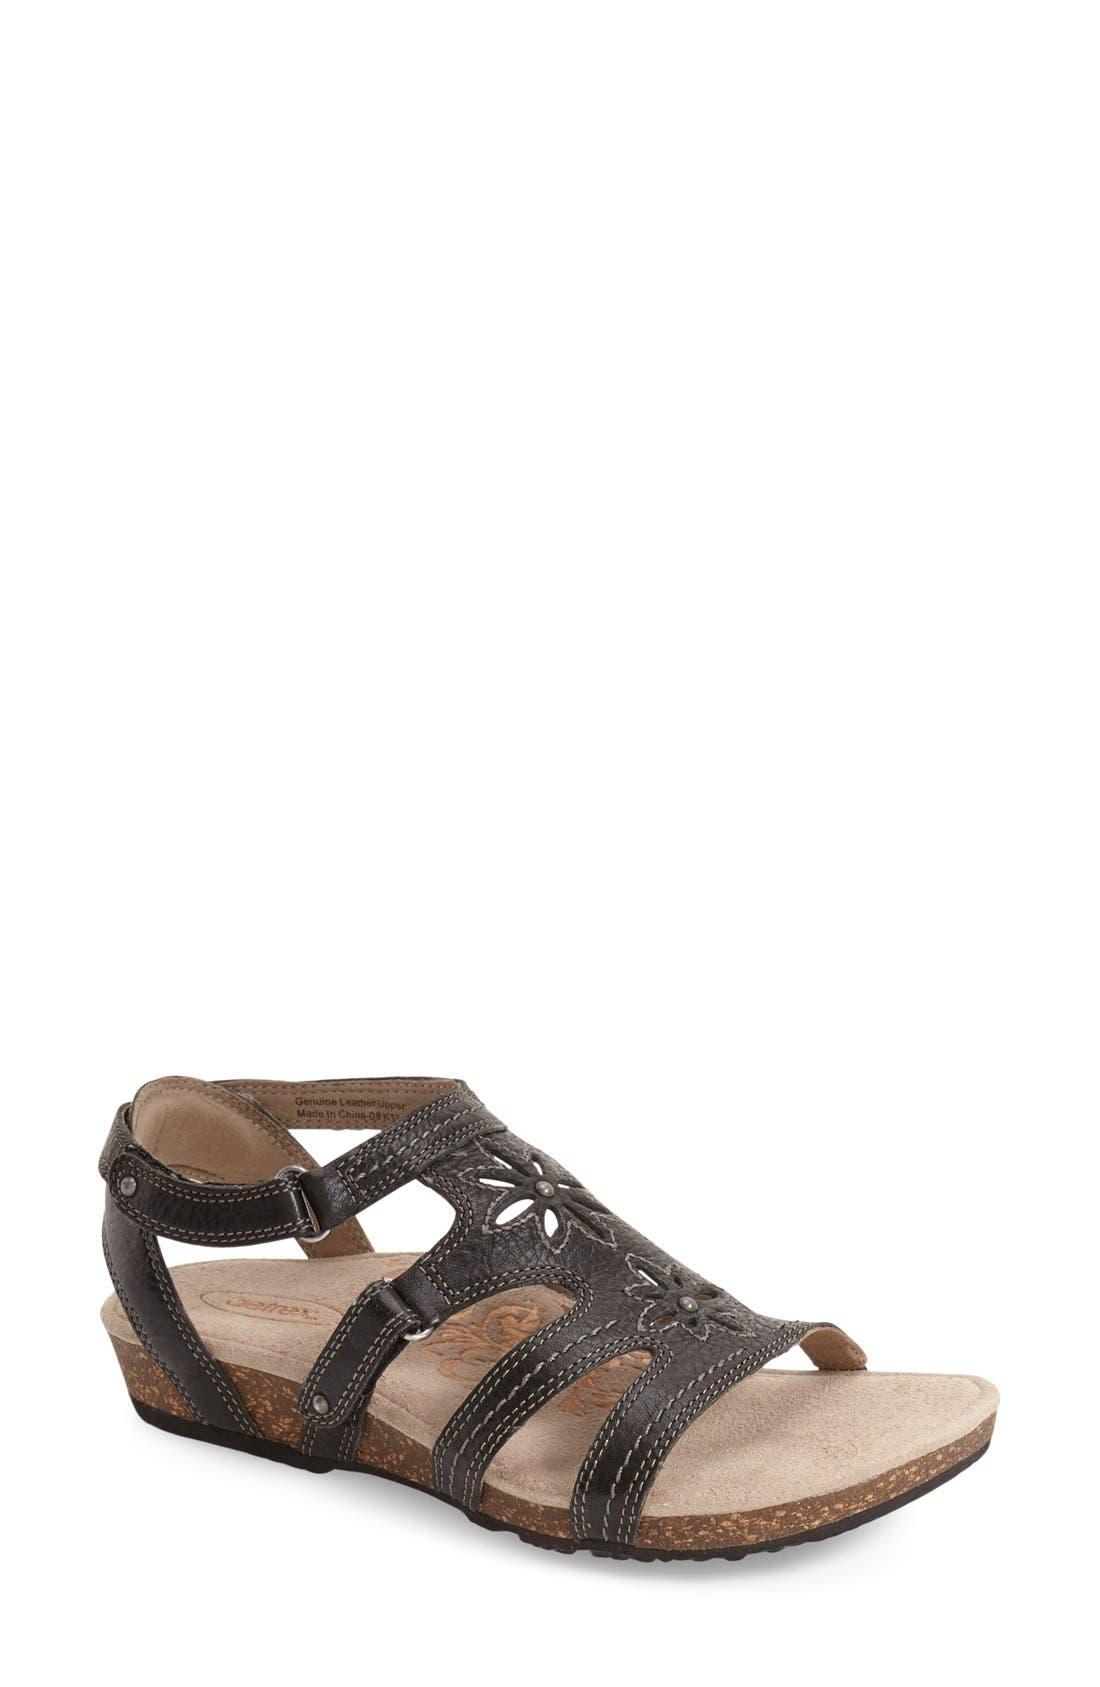 AETREX Natasha Gladiator Sandal